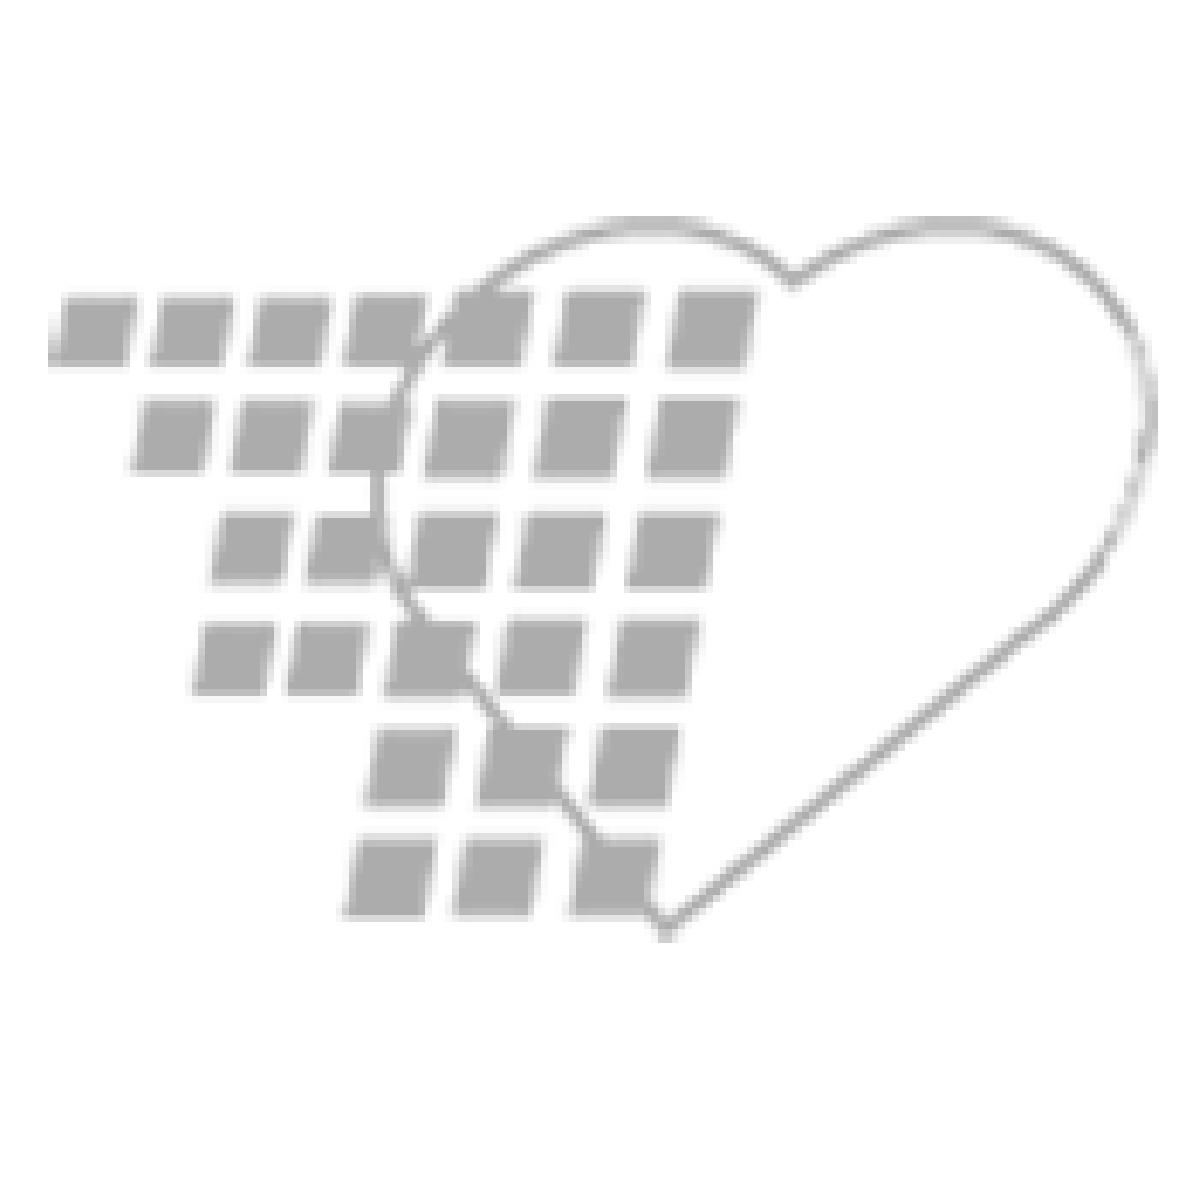 02 31 51 graham field jaeger readingtest eye chart pocket nurse 02 31 51 graham field jaeger readingtest eye chart nvjuhfo Image collections